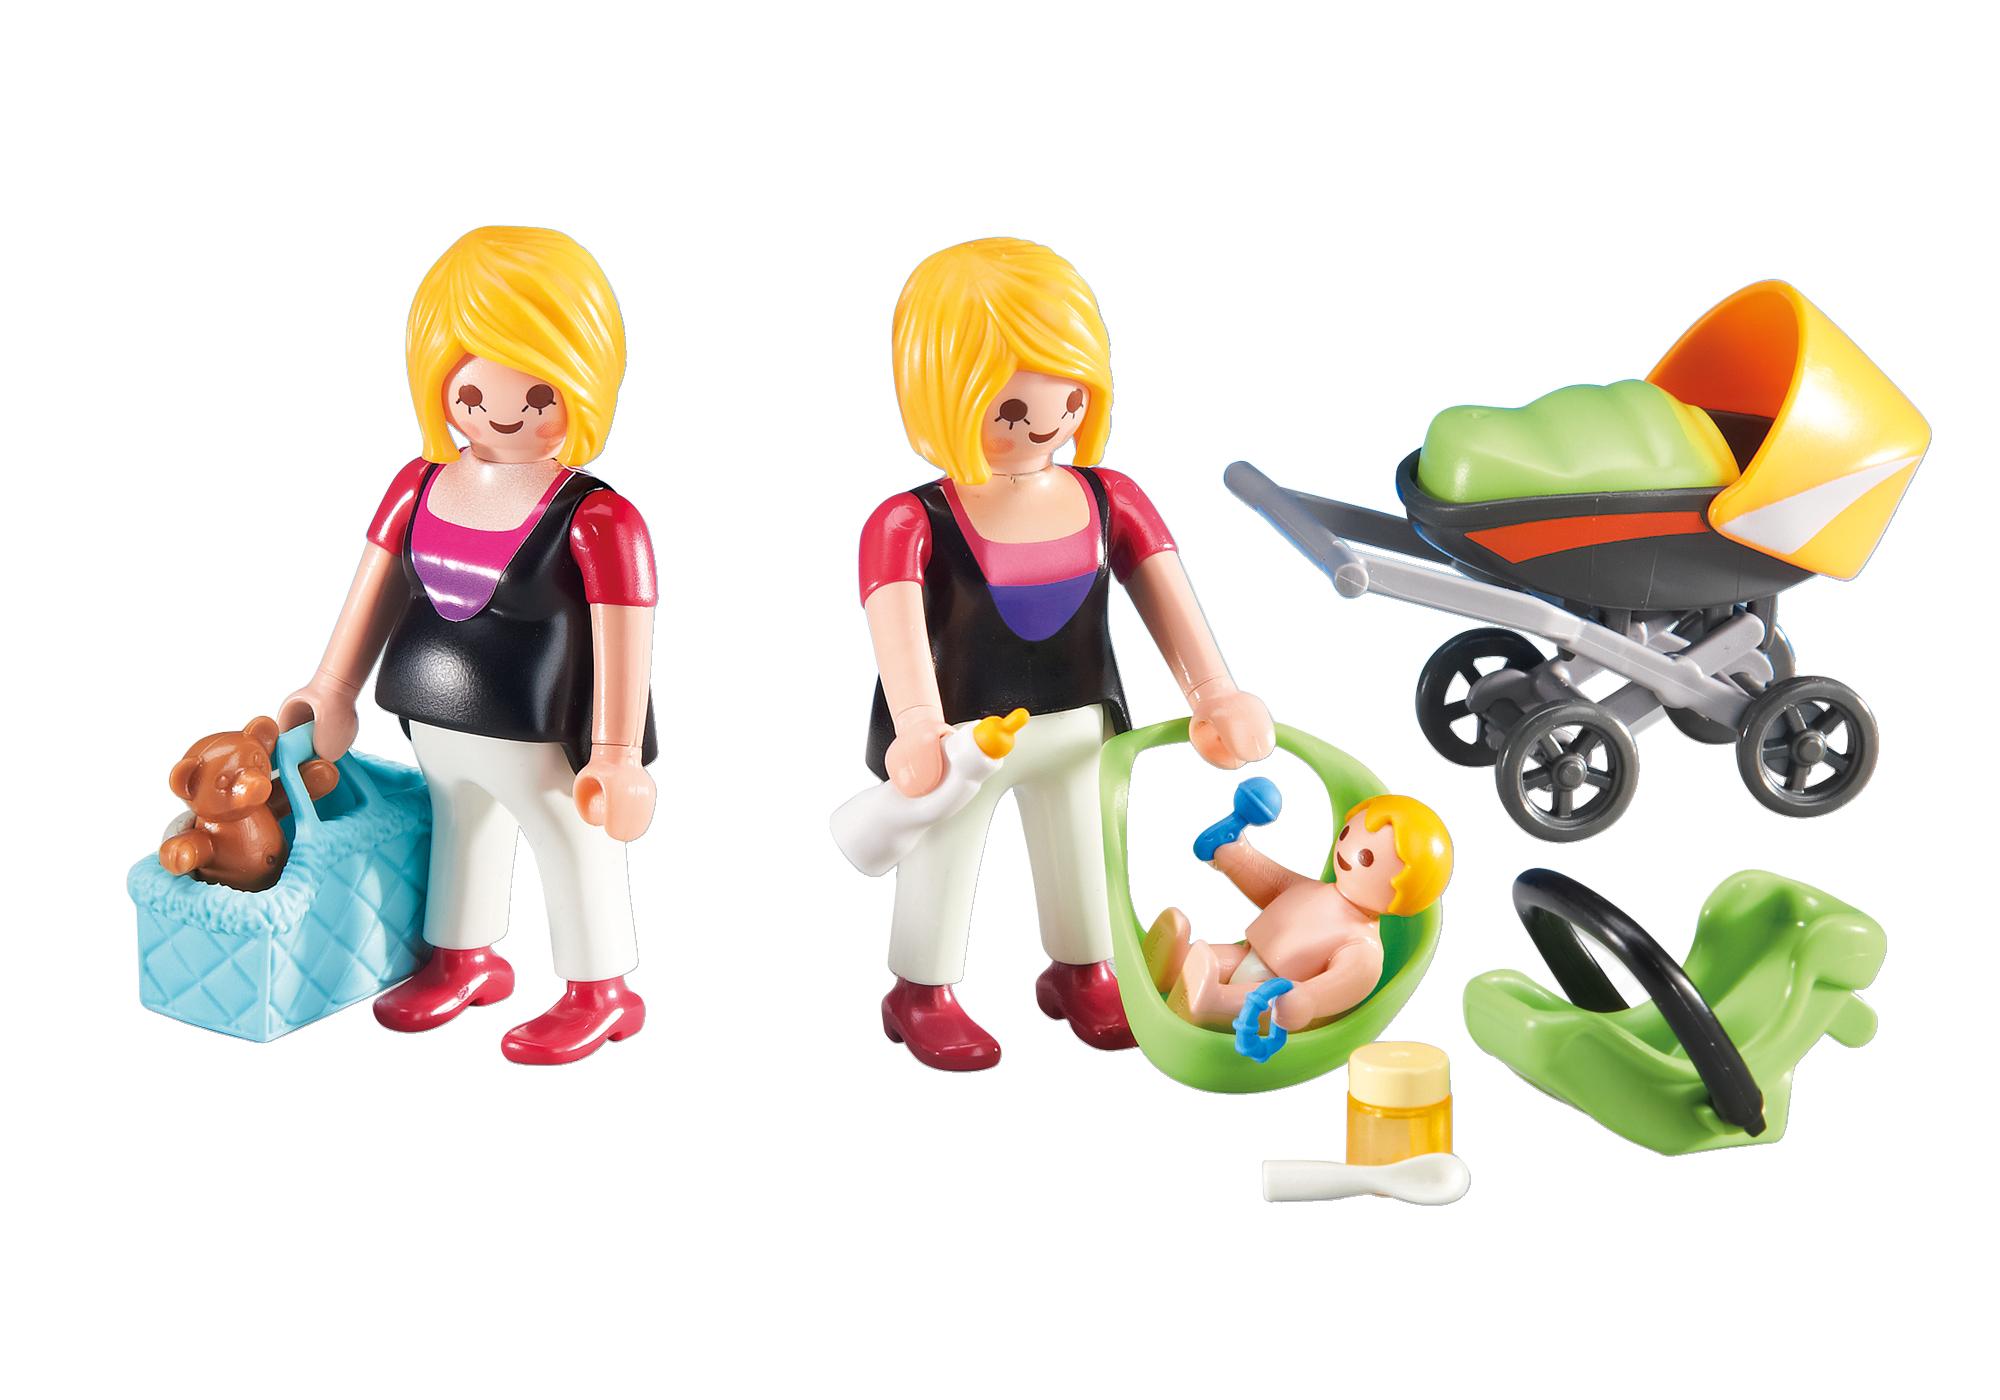 http://media.playmobil.com/i/playmobil/6447_product_detail/Schwangere und Mama mit Baby